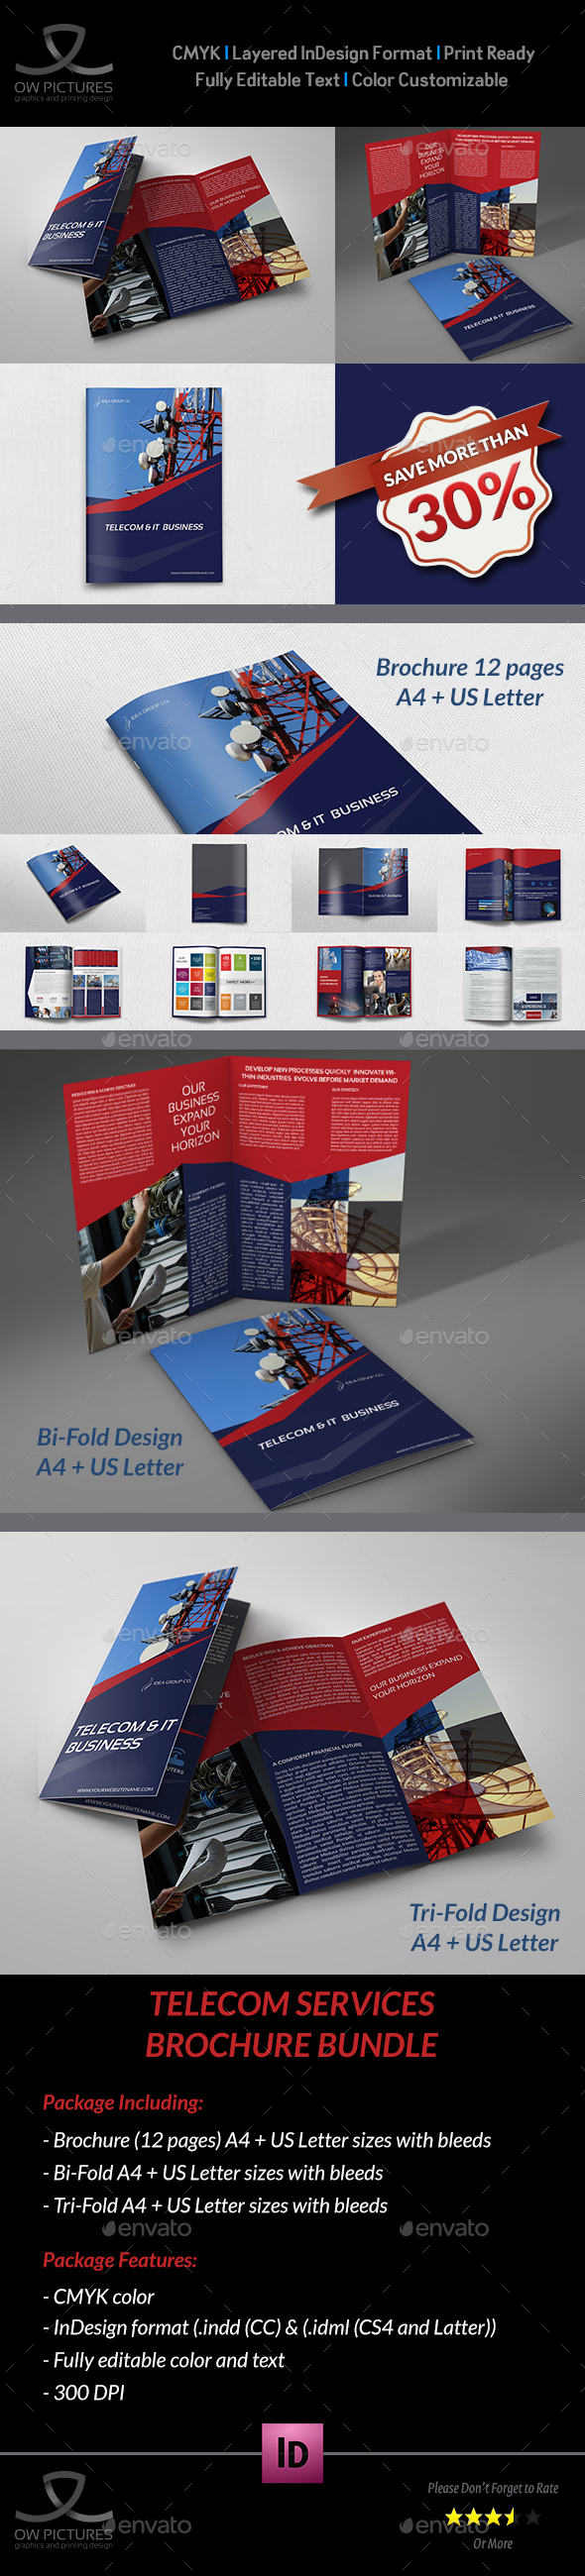 Telecom Services Brochure Bundle Template - Corporate Brochures